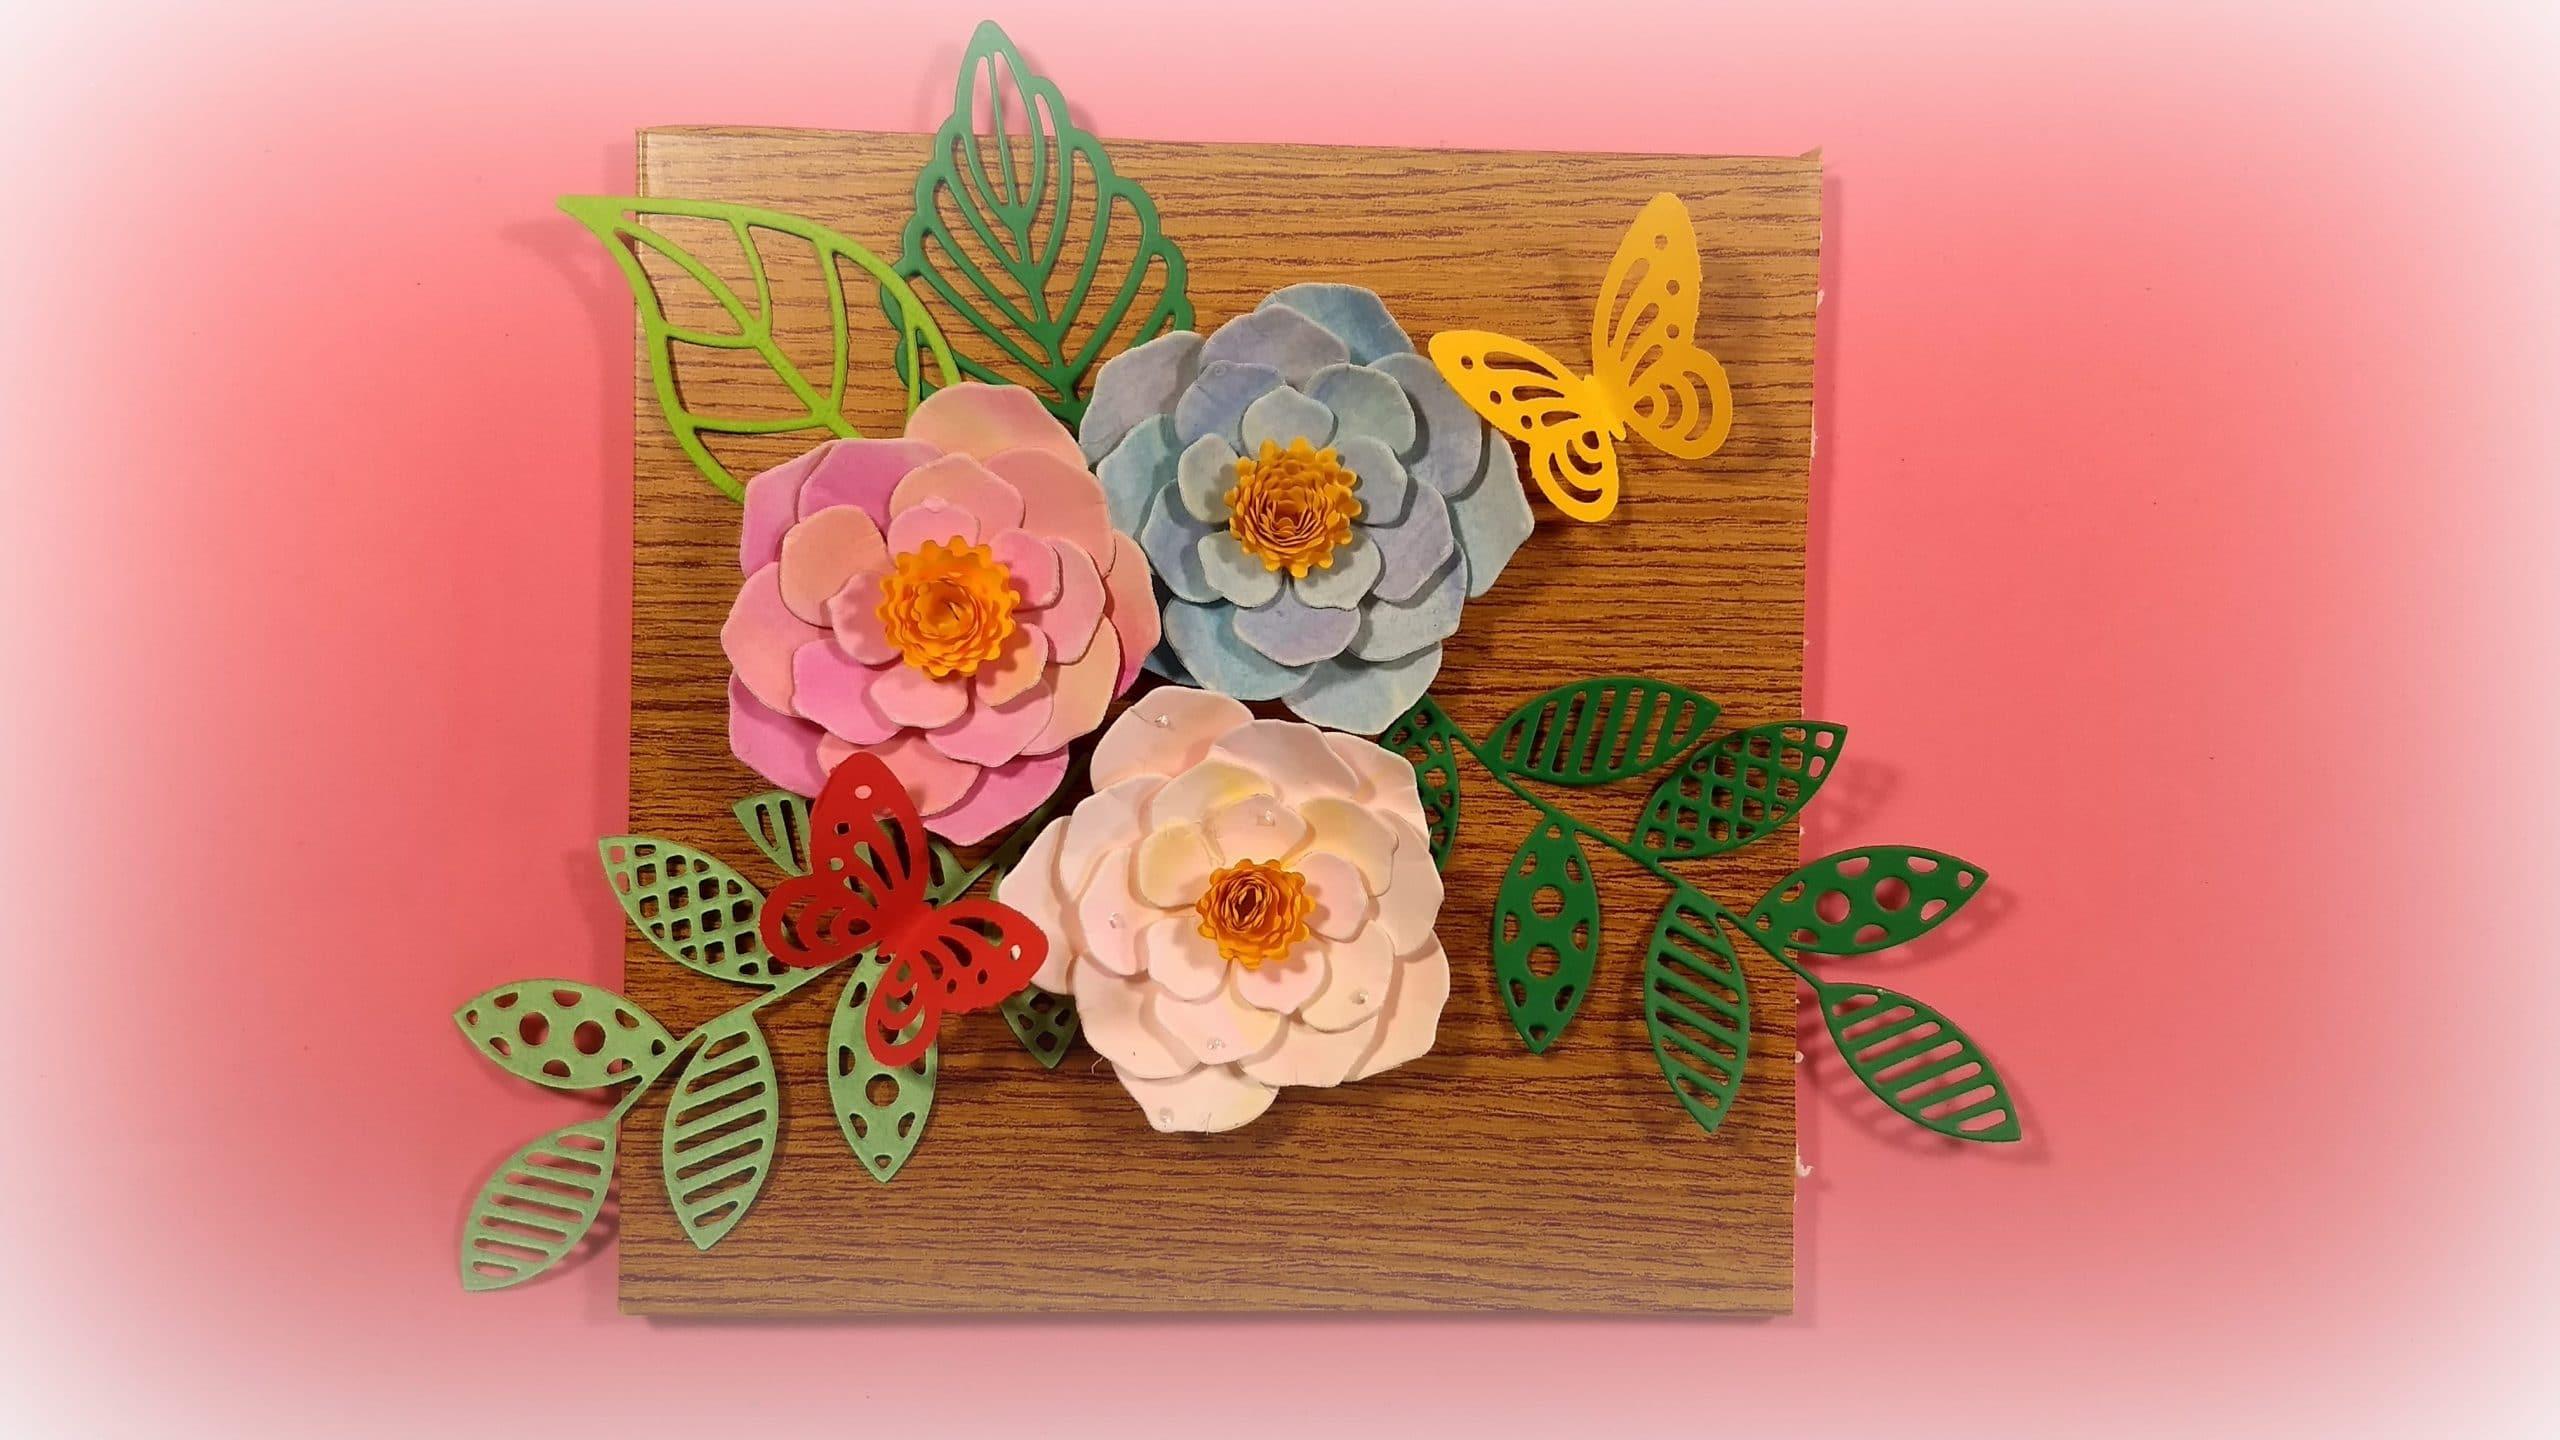 C mo hacer un cuadro de flores de papel para decorar tu - Manualidades de papel para decorar ...